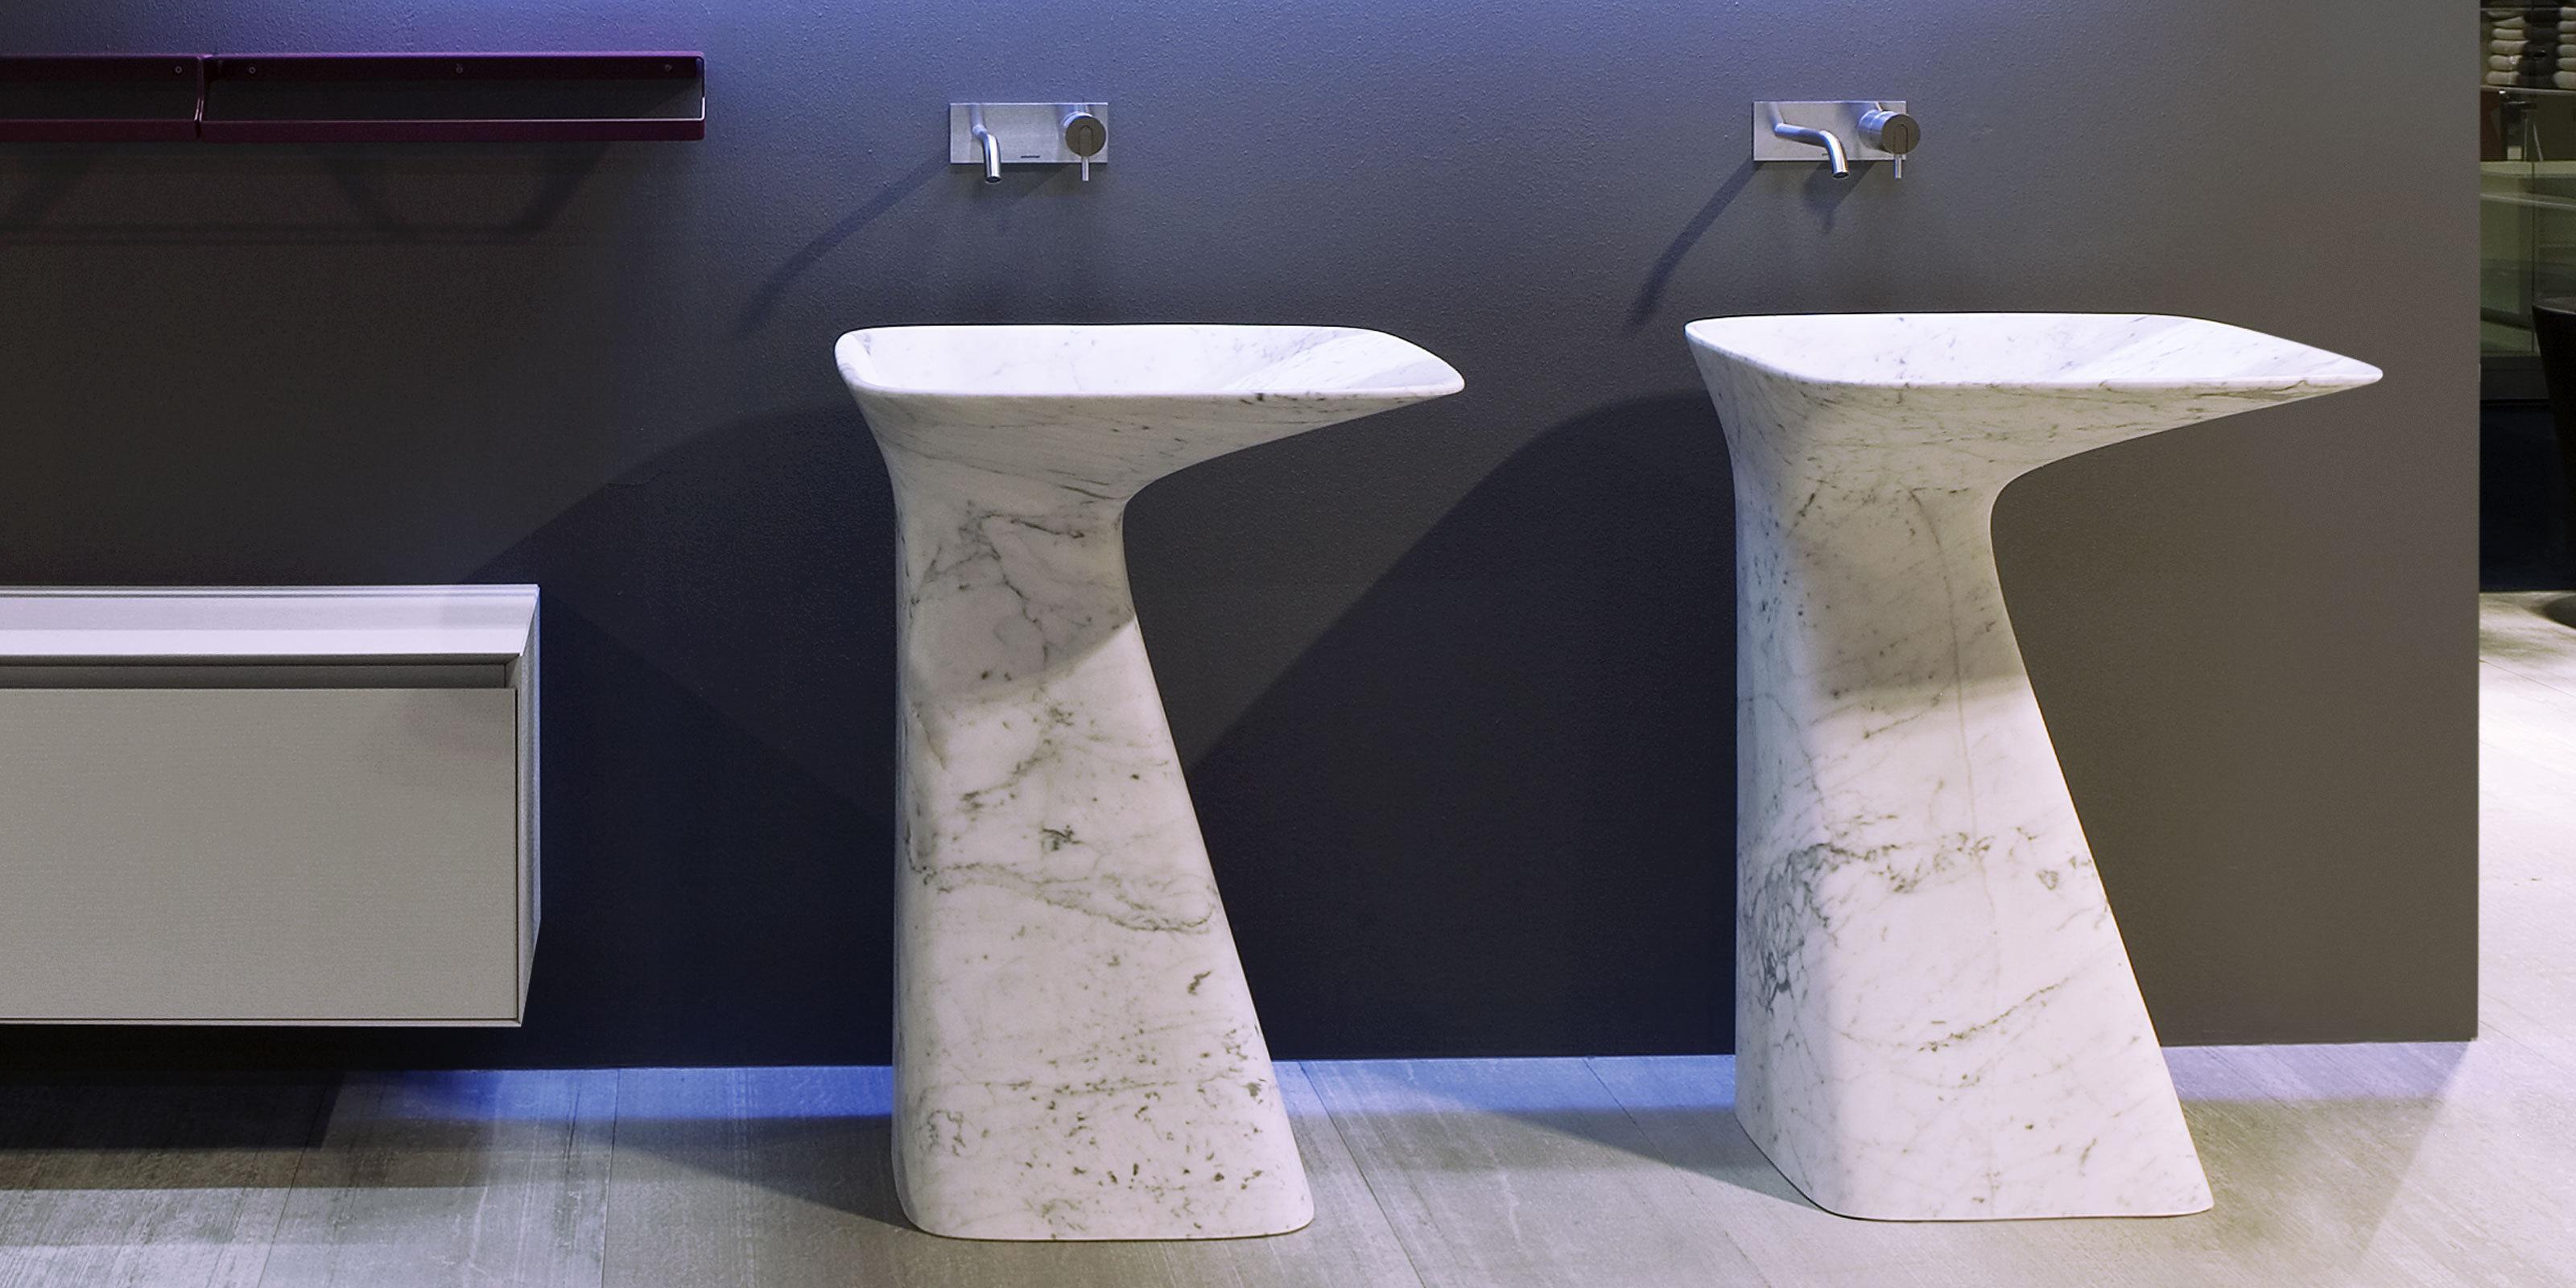 بالصور مغاسل حمامات , فخامة مغاسل دورات المياه تجدها هنا 1390 7